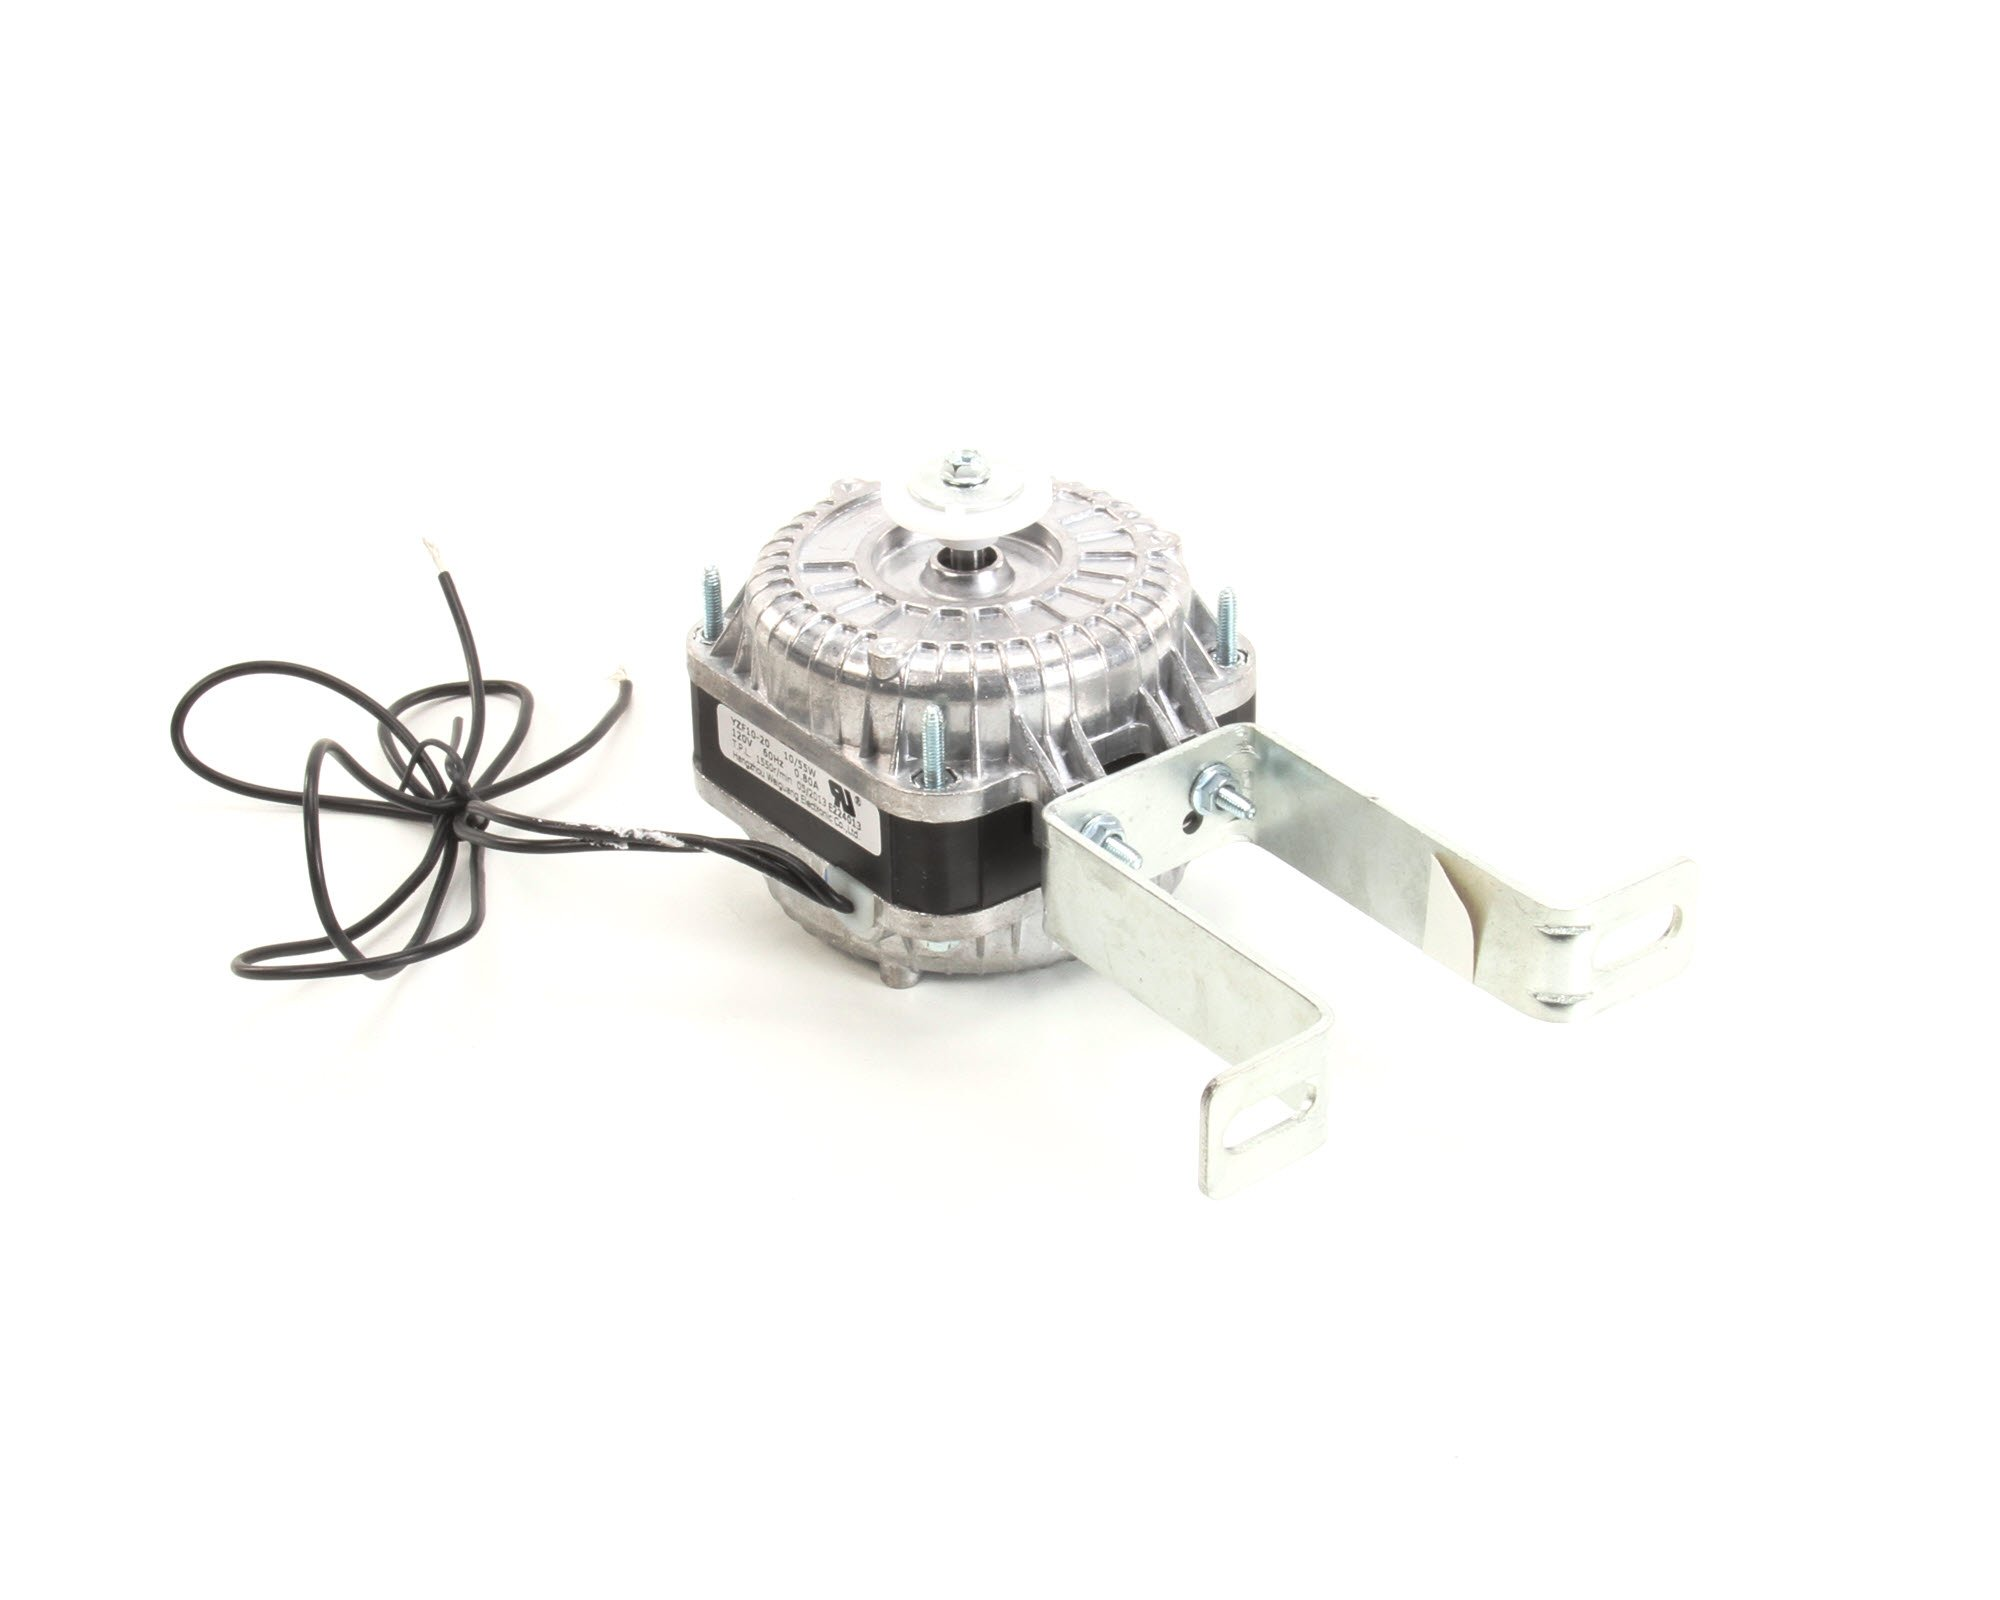 Fagor Commercial 602105M0003 Fan Evaporator